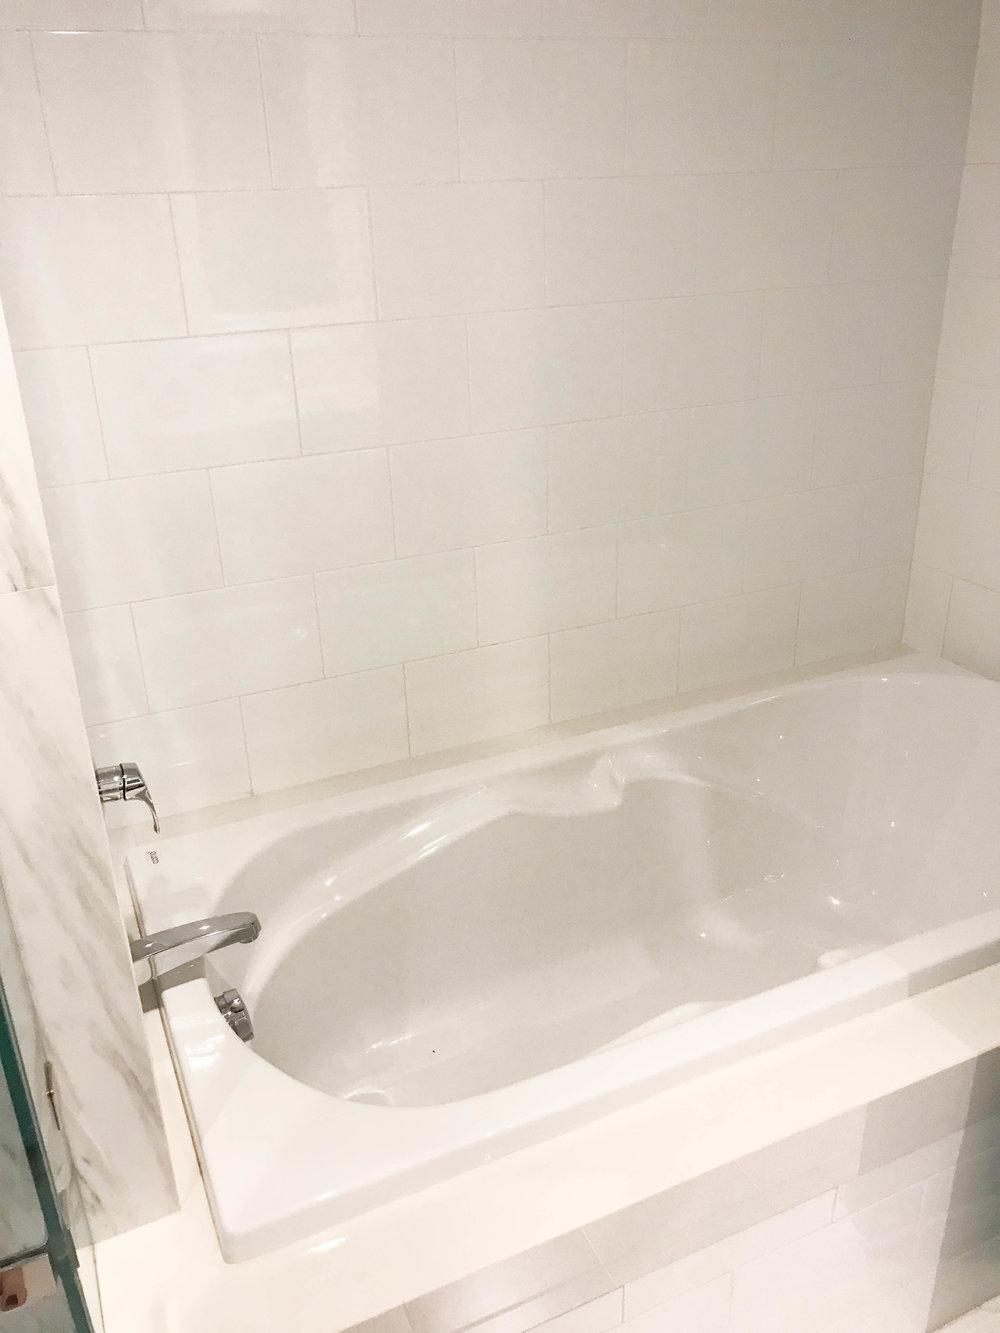 Cade Kudu Hotel - Koi Yao Noi, Thailand - Coastal Bathroom Bath Tub